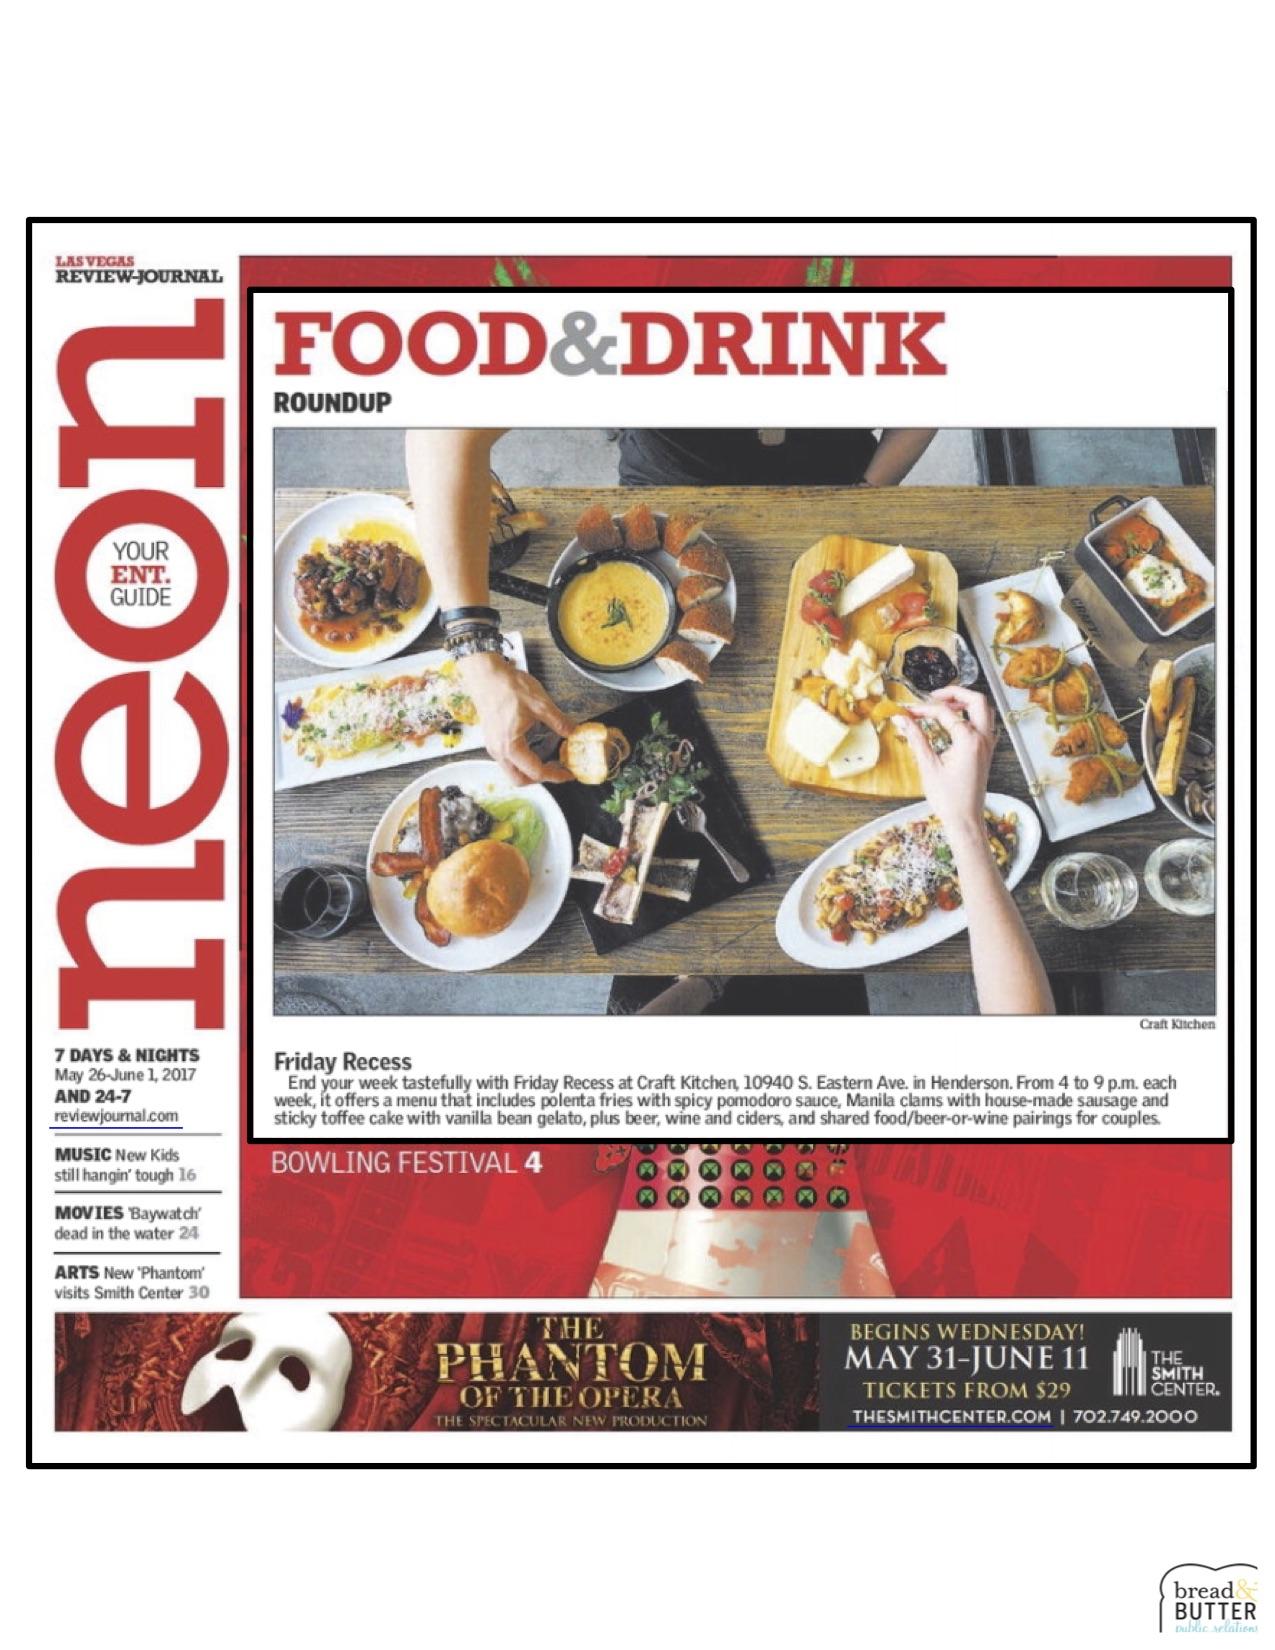 Las Vegas Review-Journal 5.26.17 CRAFTkitchen.jpg